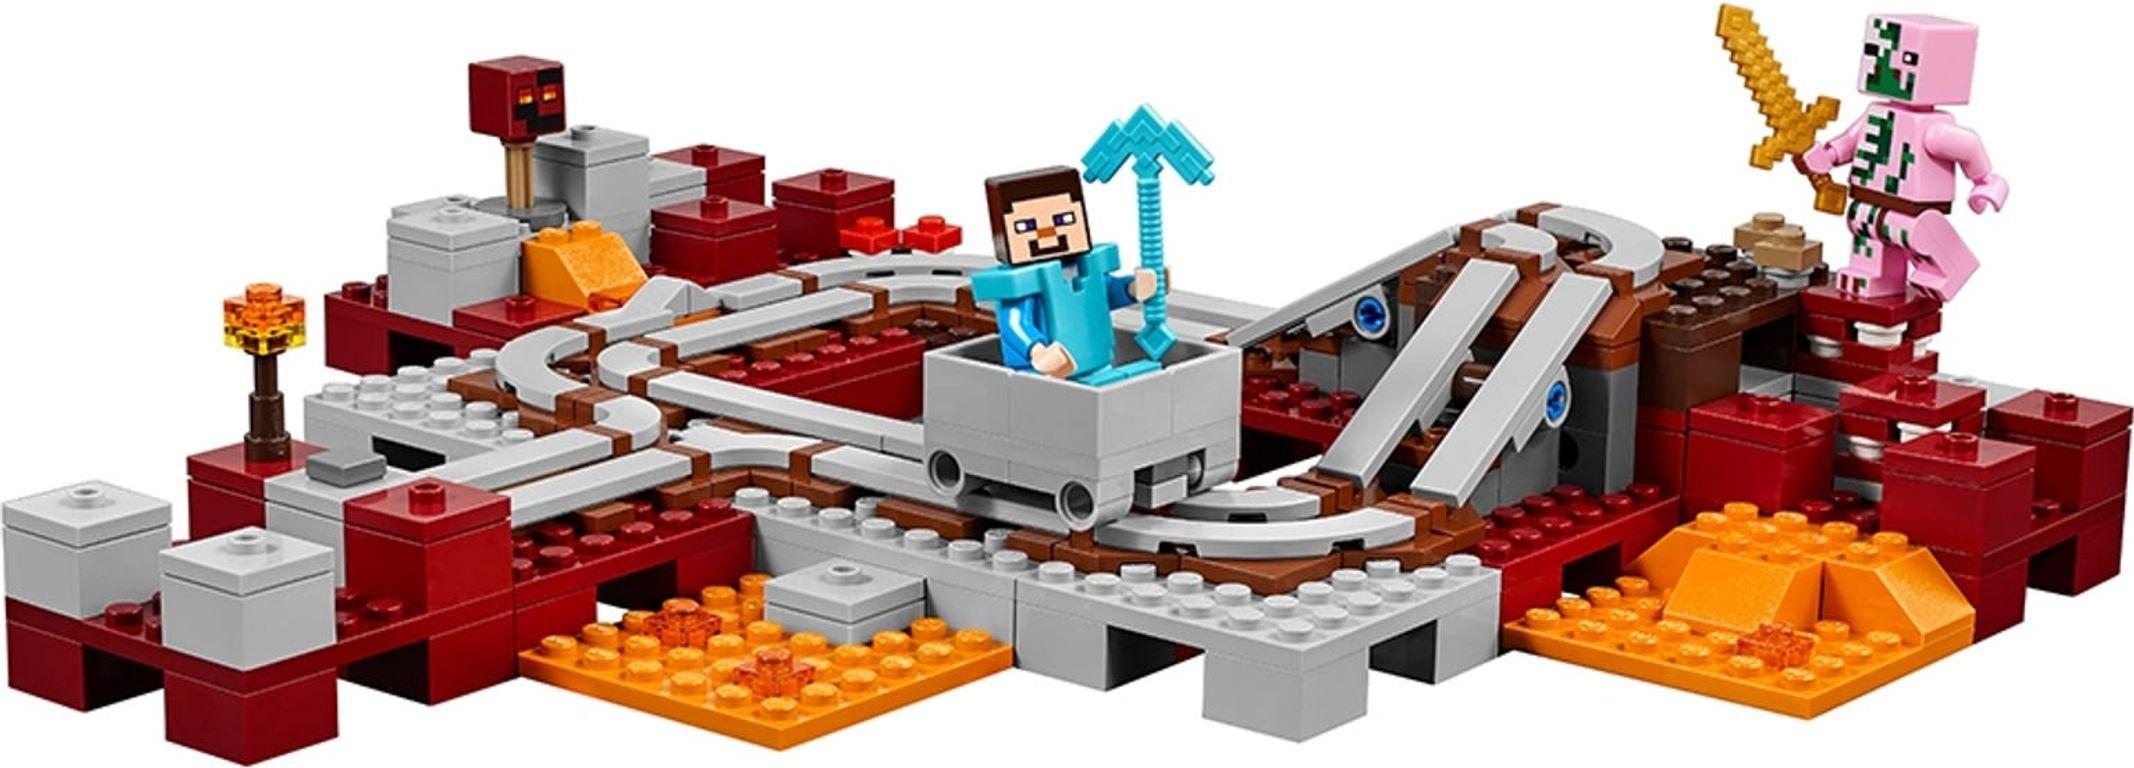 The Nether Railway gameplay